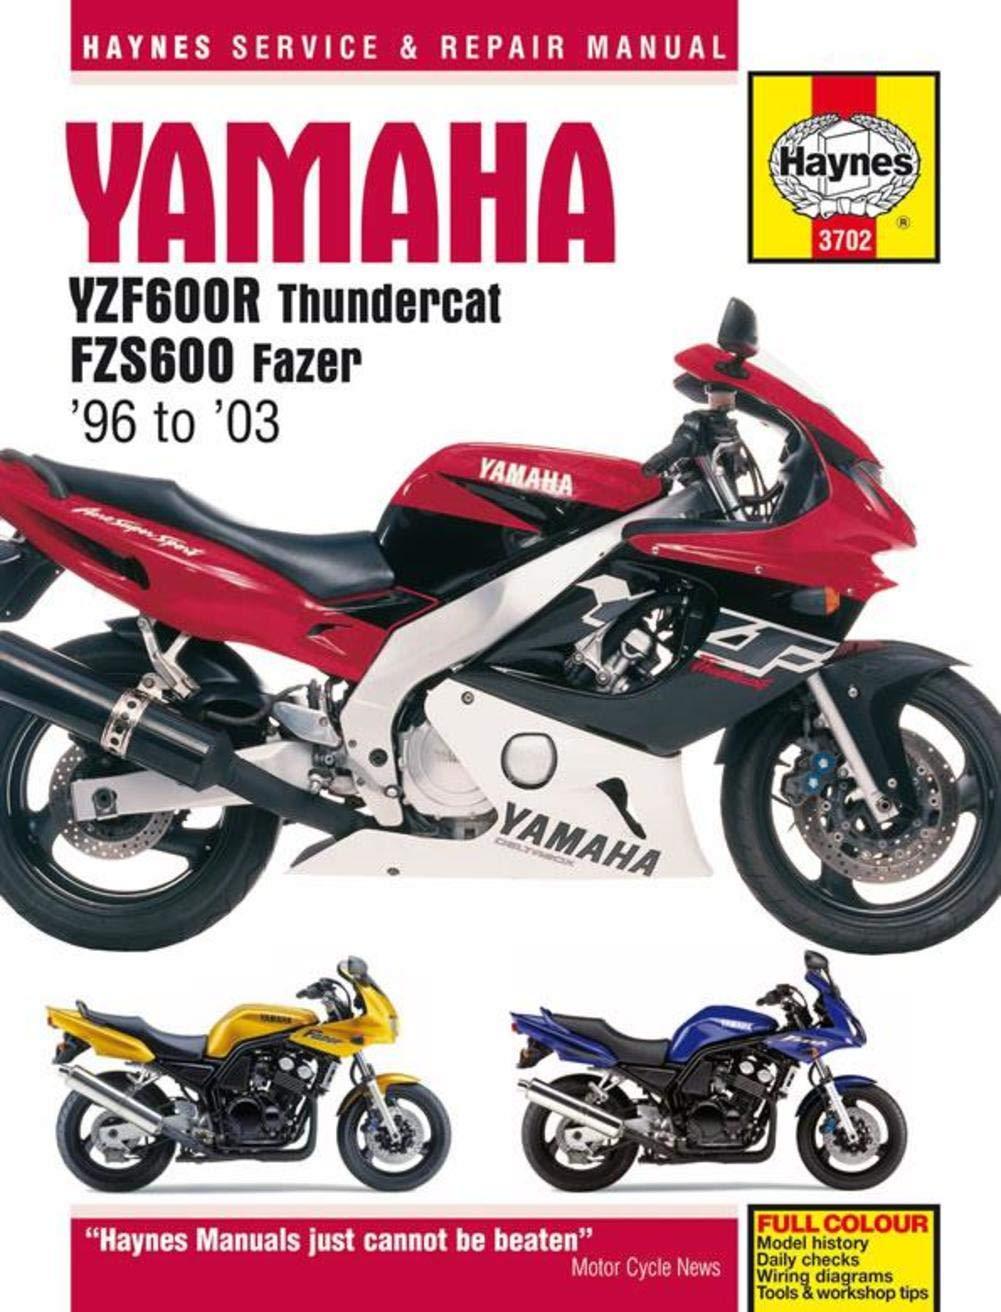 Yamaha Yzf600 Wiring Diagram Content Resource Of Ysr50 2002 Yzf600r Trusted Schematics Rh Roadntracks Com 2005 Yzf 600